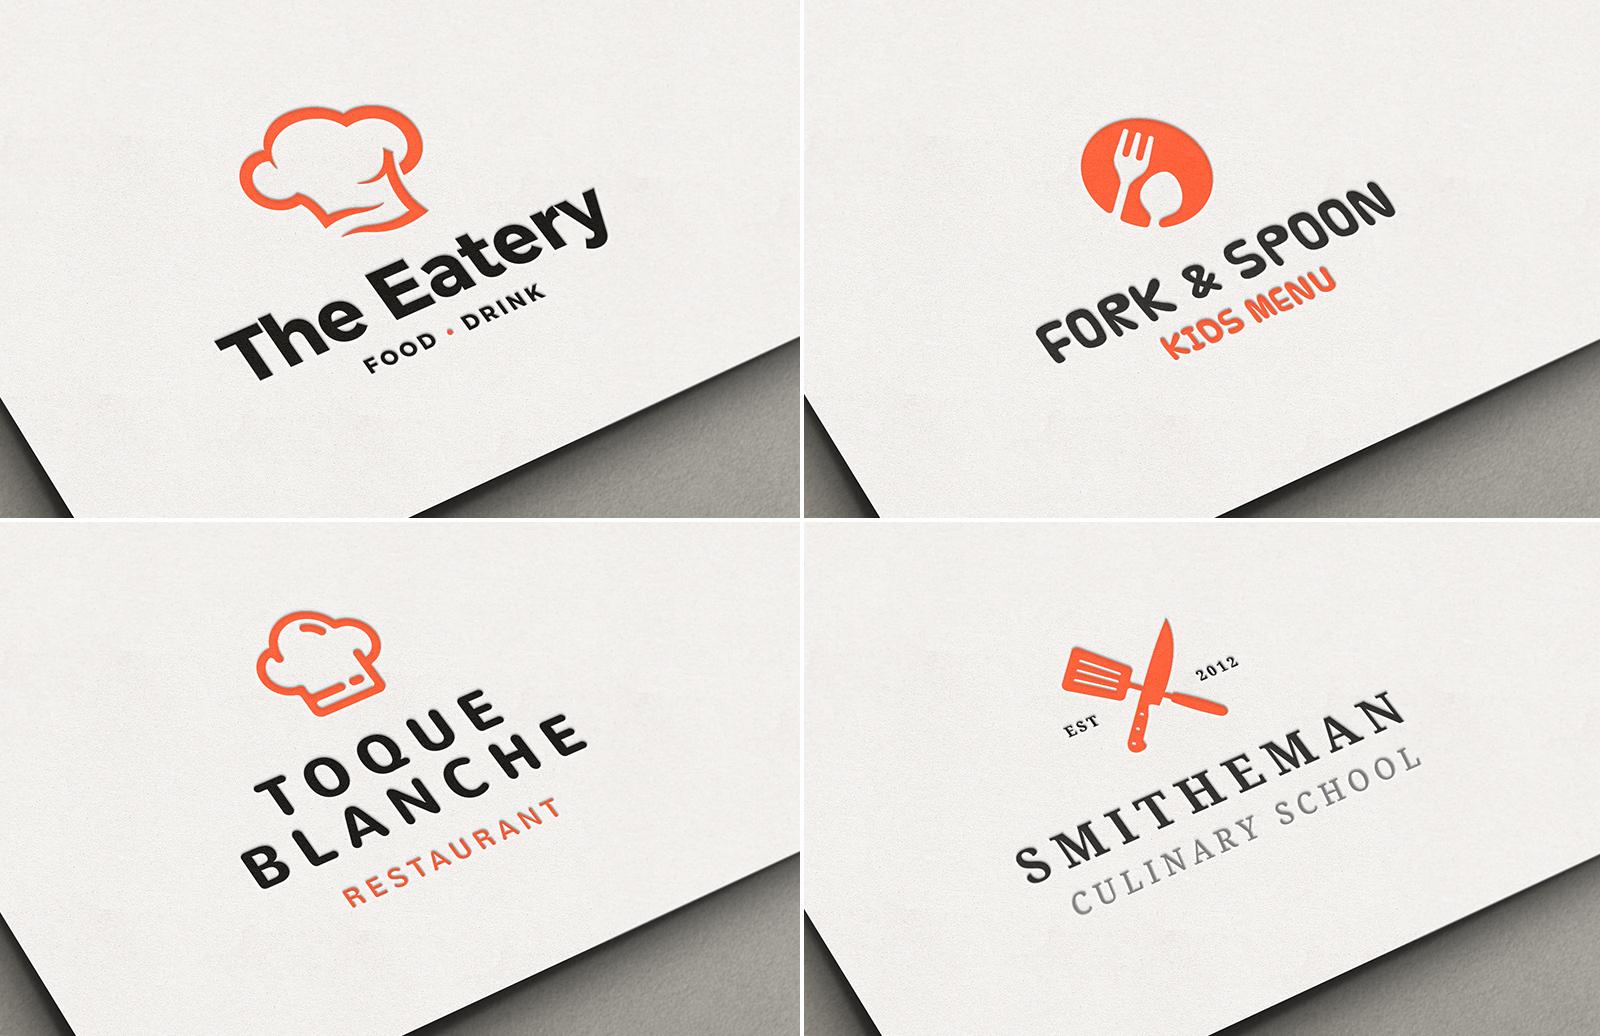 Culinary Restaurant Logos Preview 1A